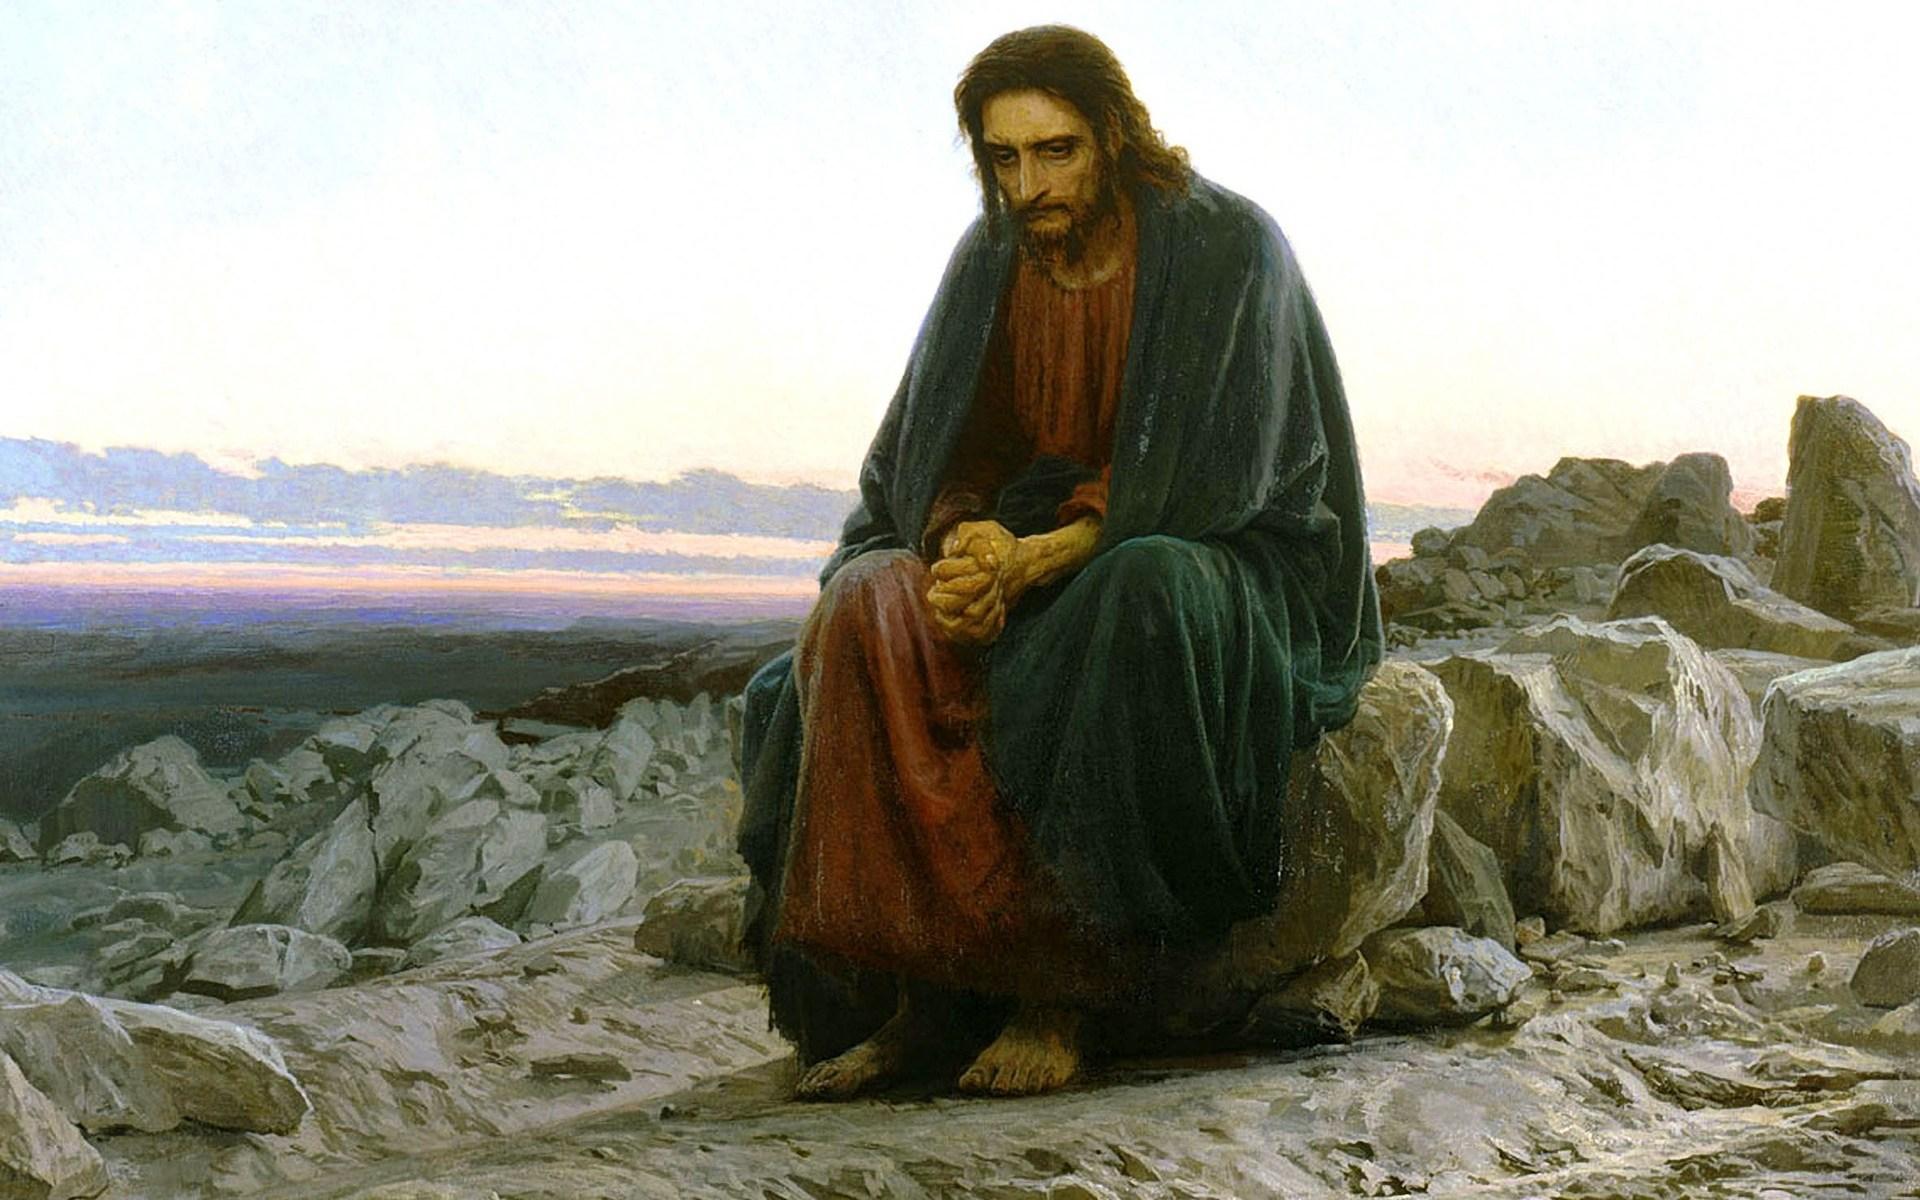 Depressed Jesus